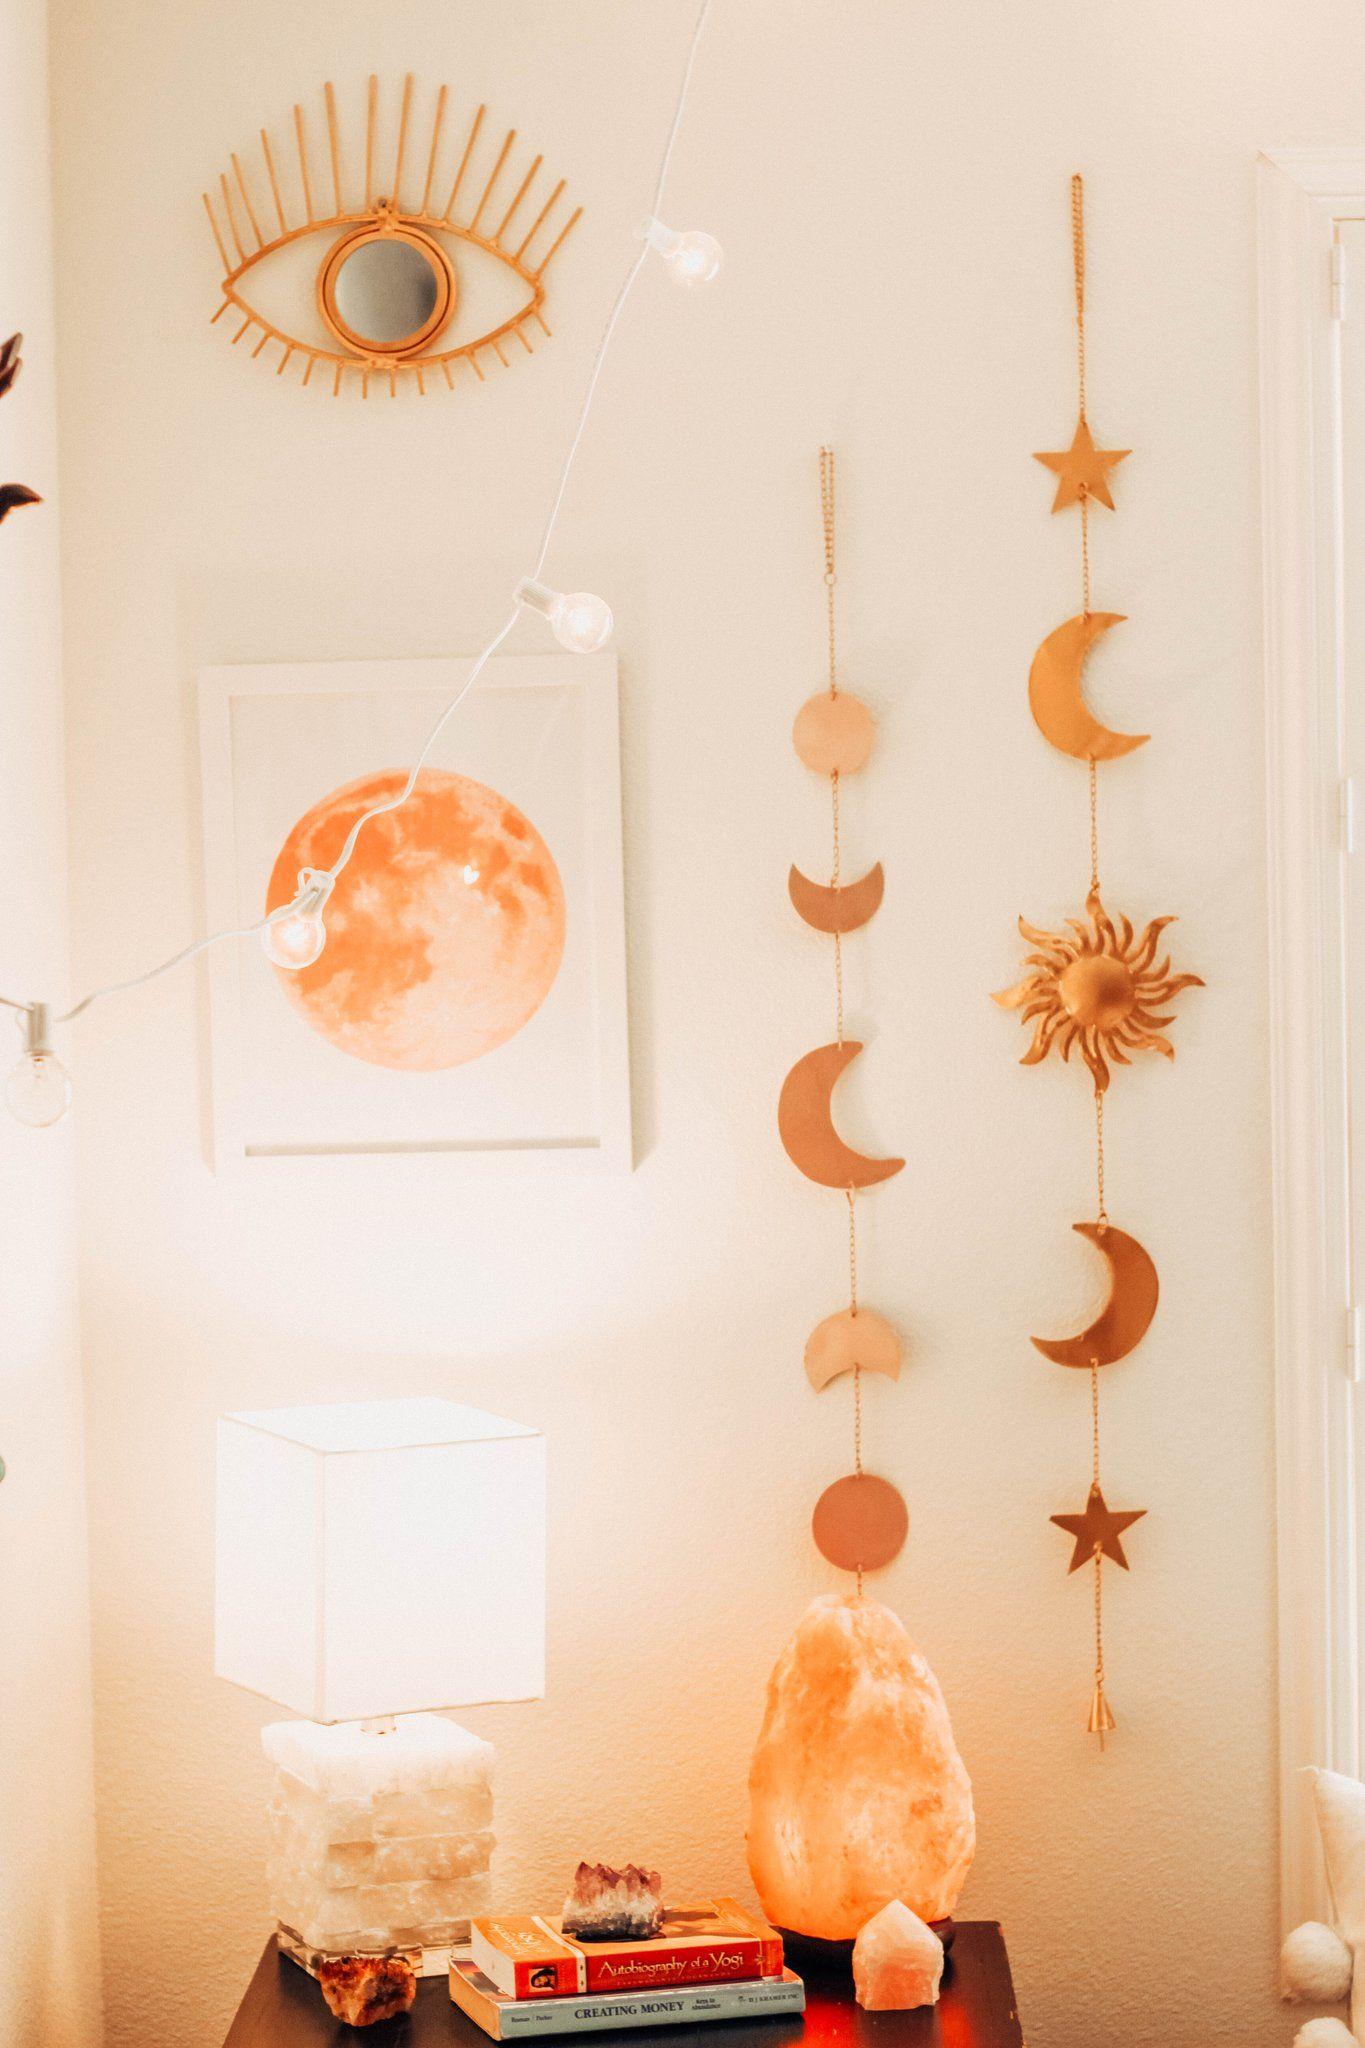 Celestial Wall Hanging Hanging Wall Decor Wall Decor Bedroom Aesthetic Bedroom